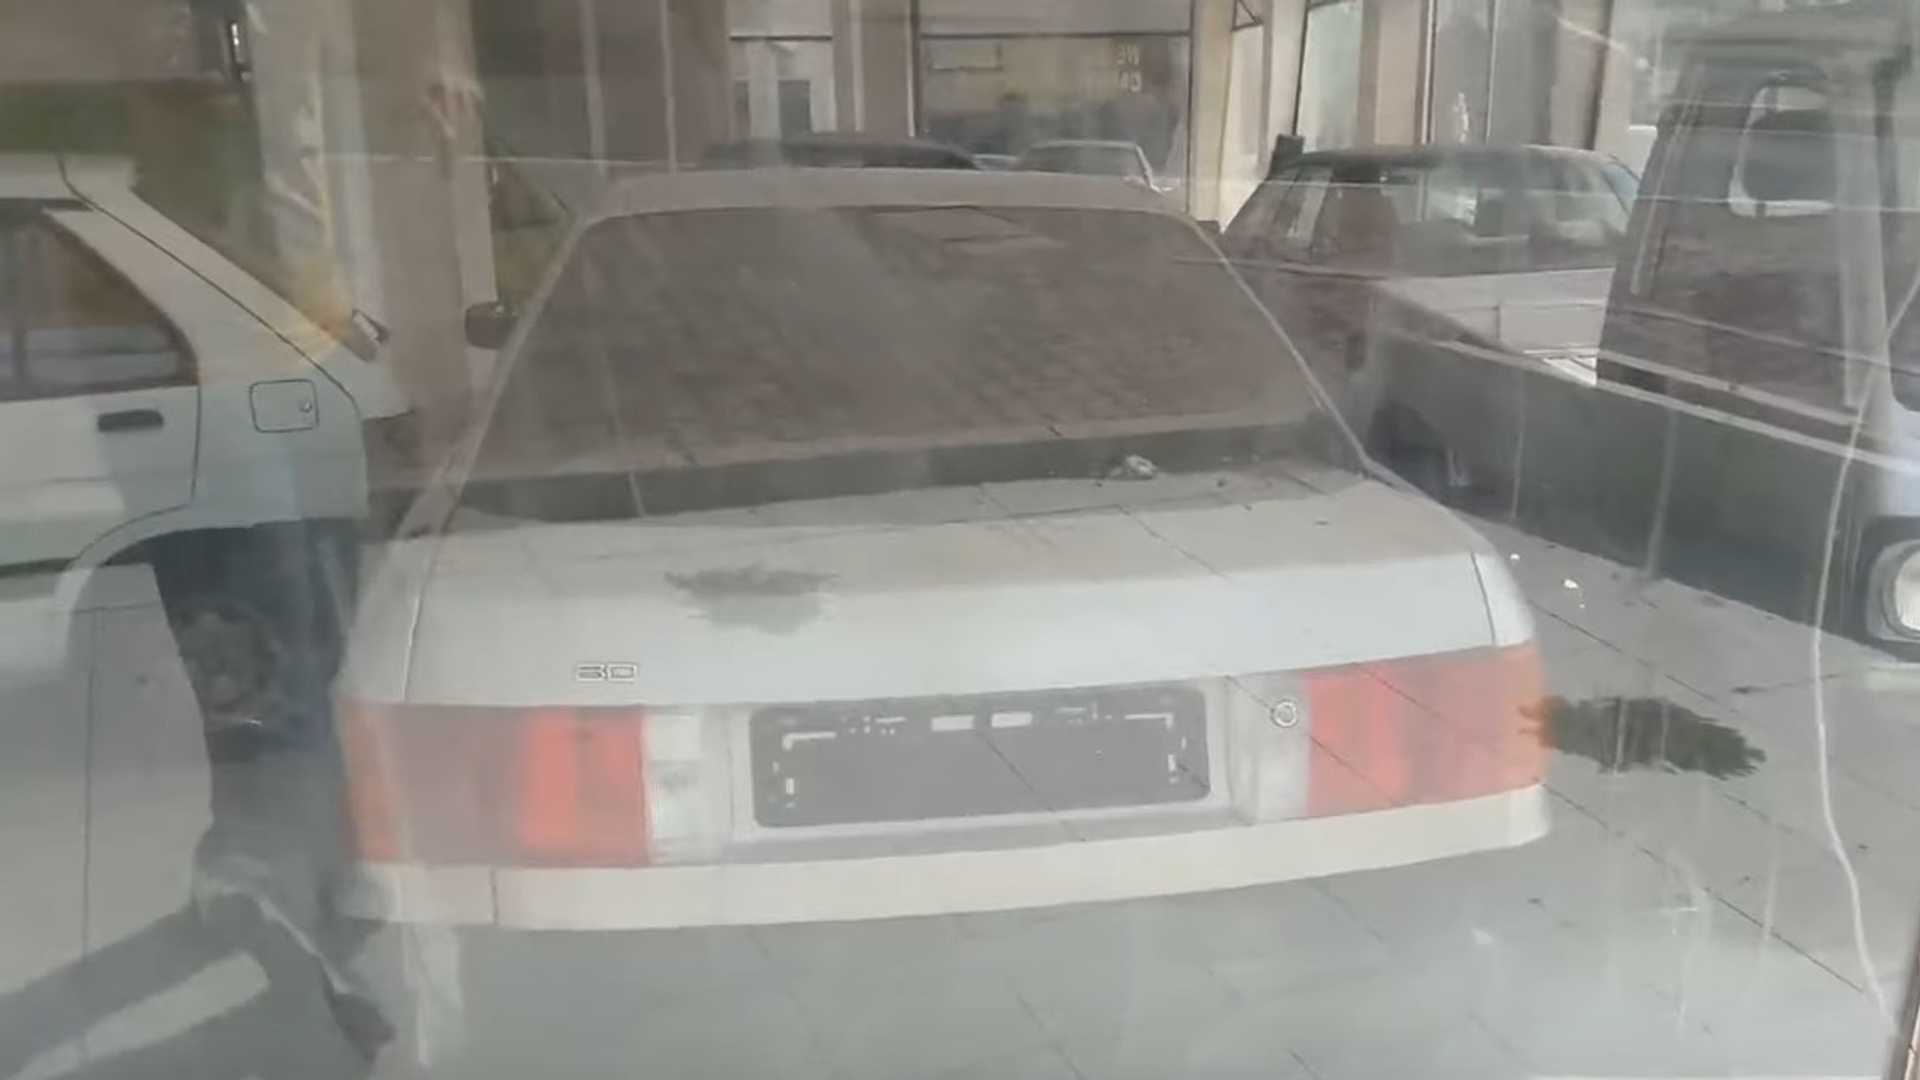 Abandoned Subaru Dealer Adds More Cars, Including An Audi 80